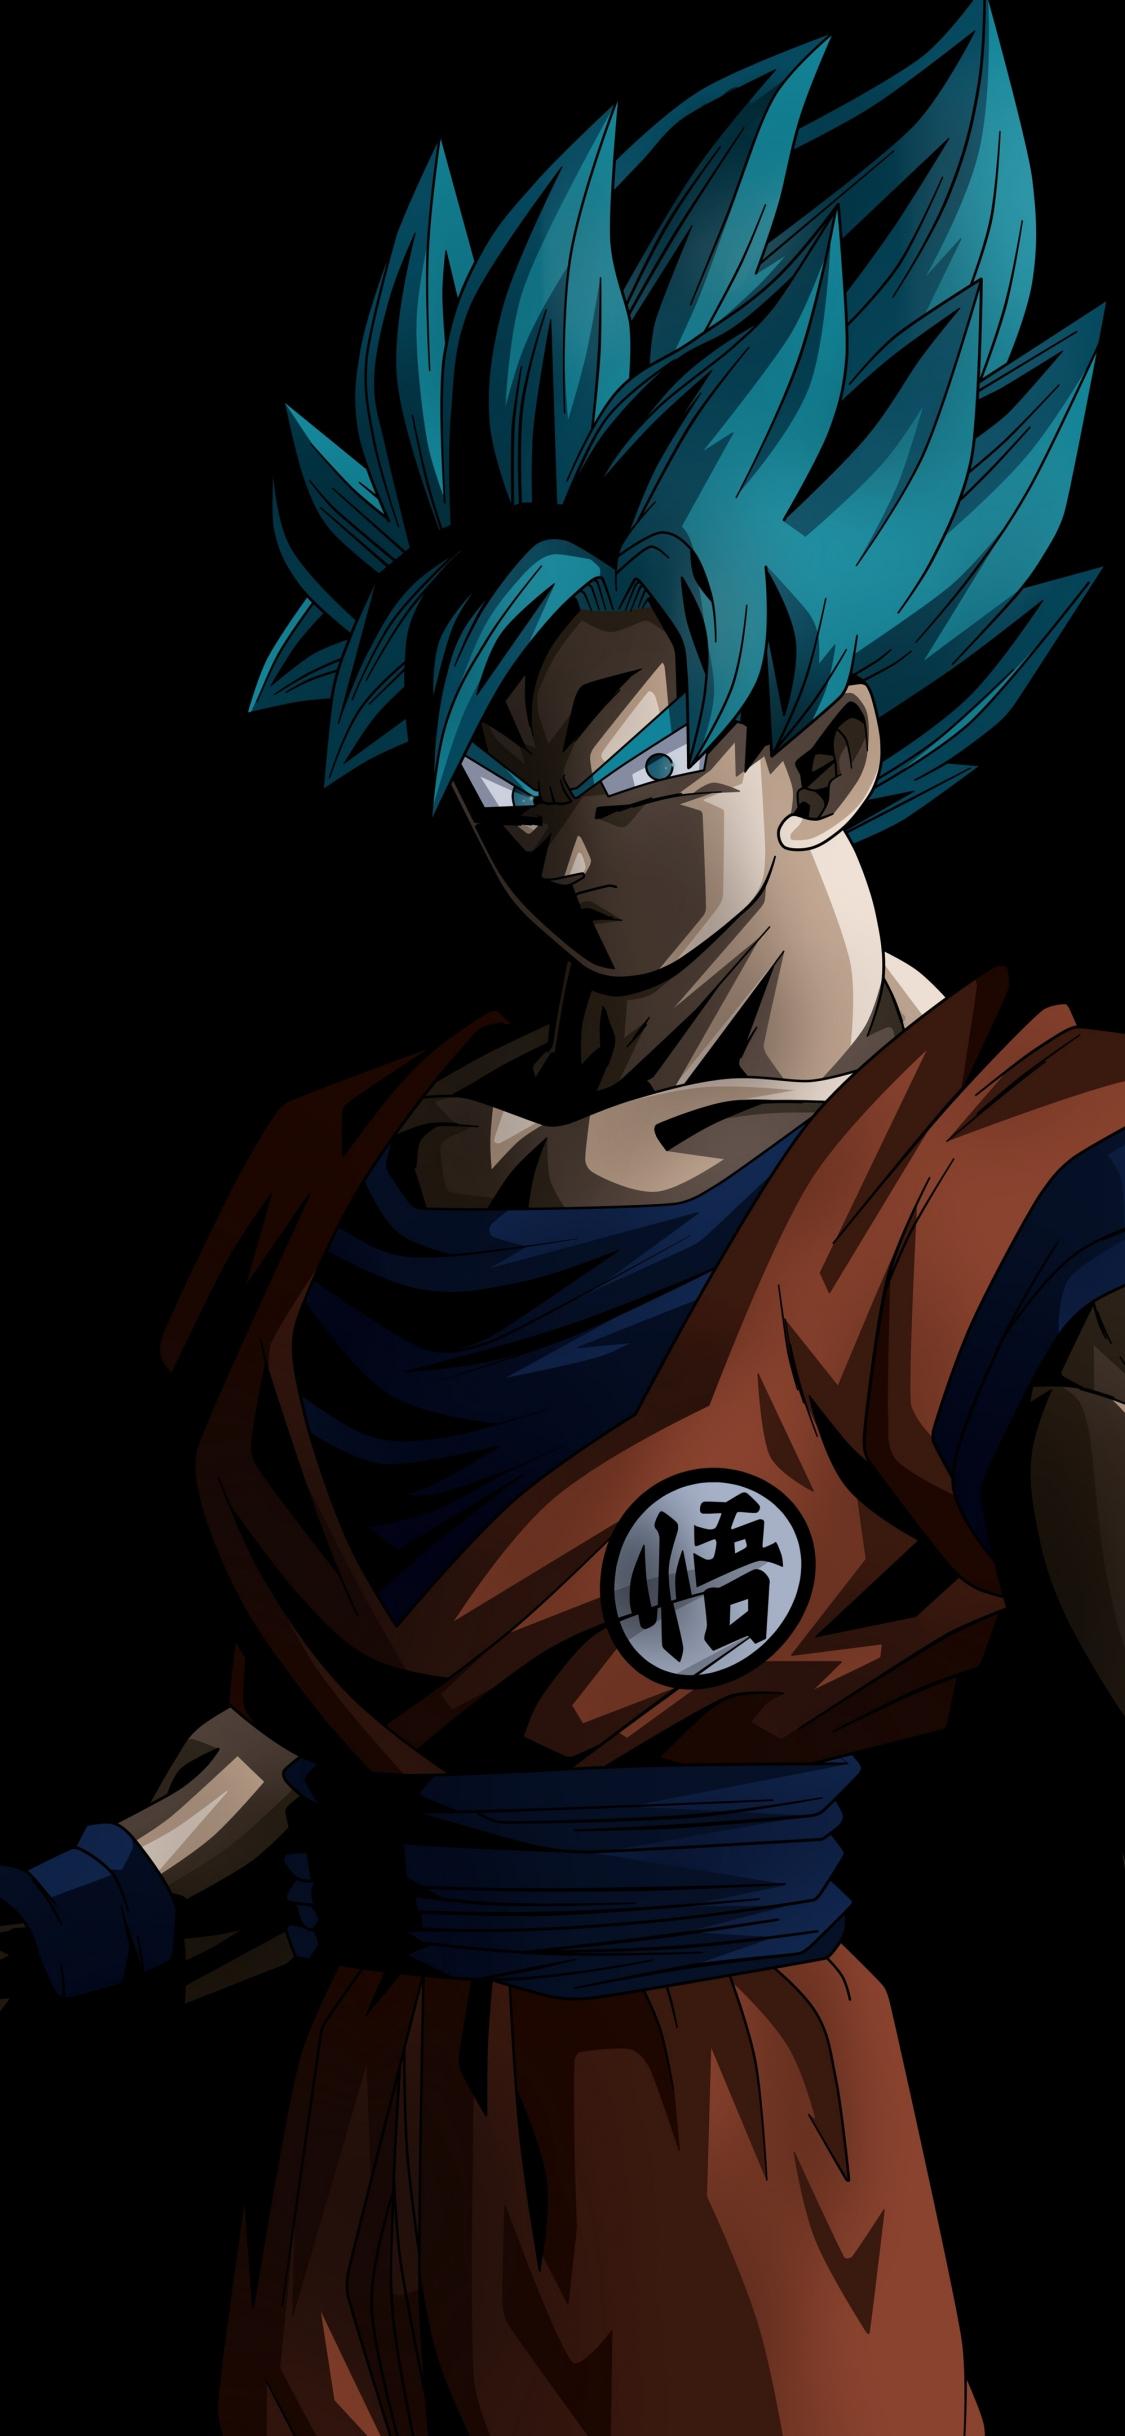 Download 1125x2436 Wallpaper Anime Minimal Dragon Ball